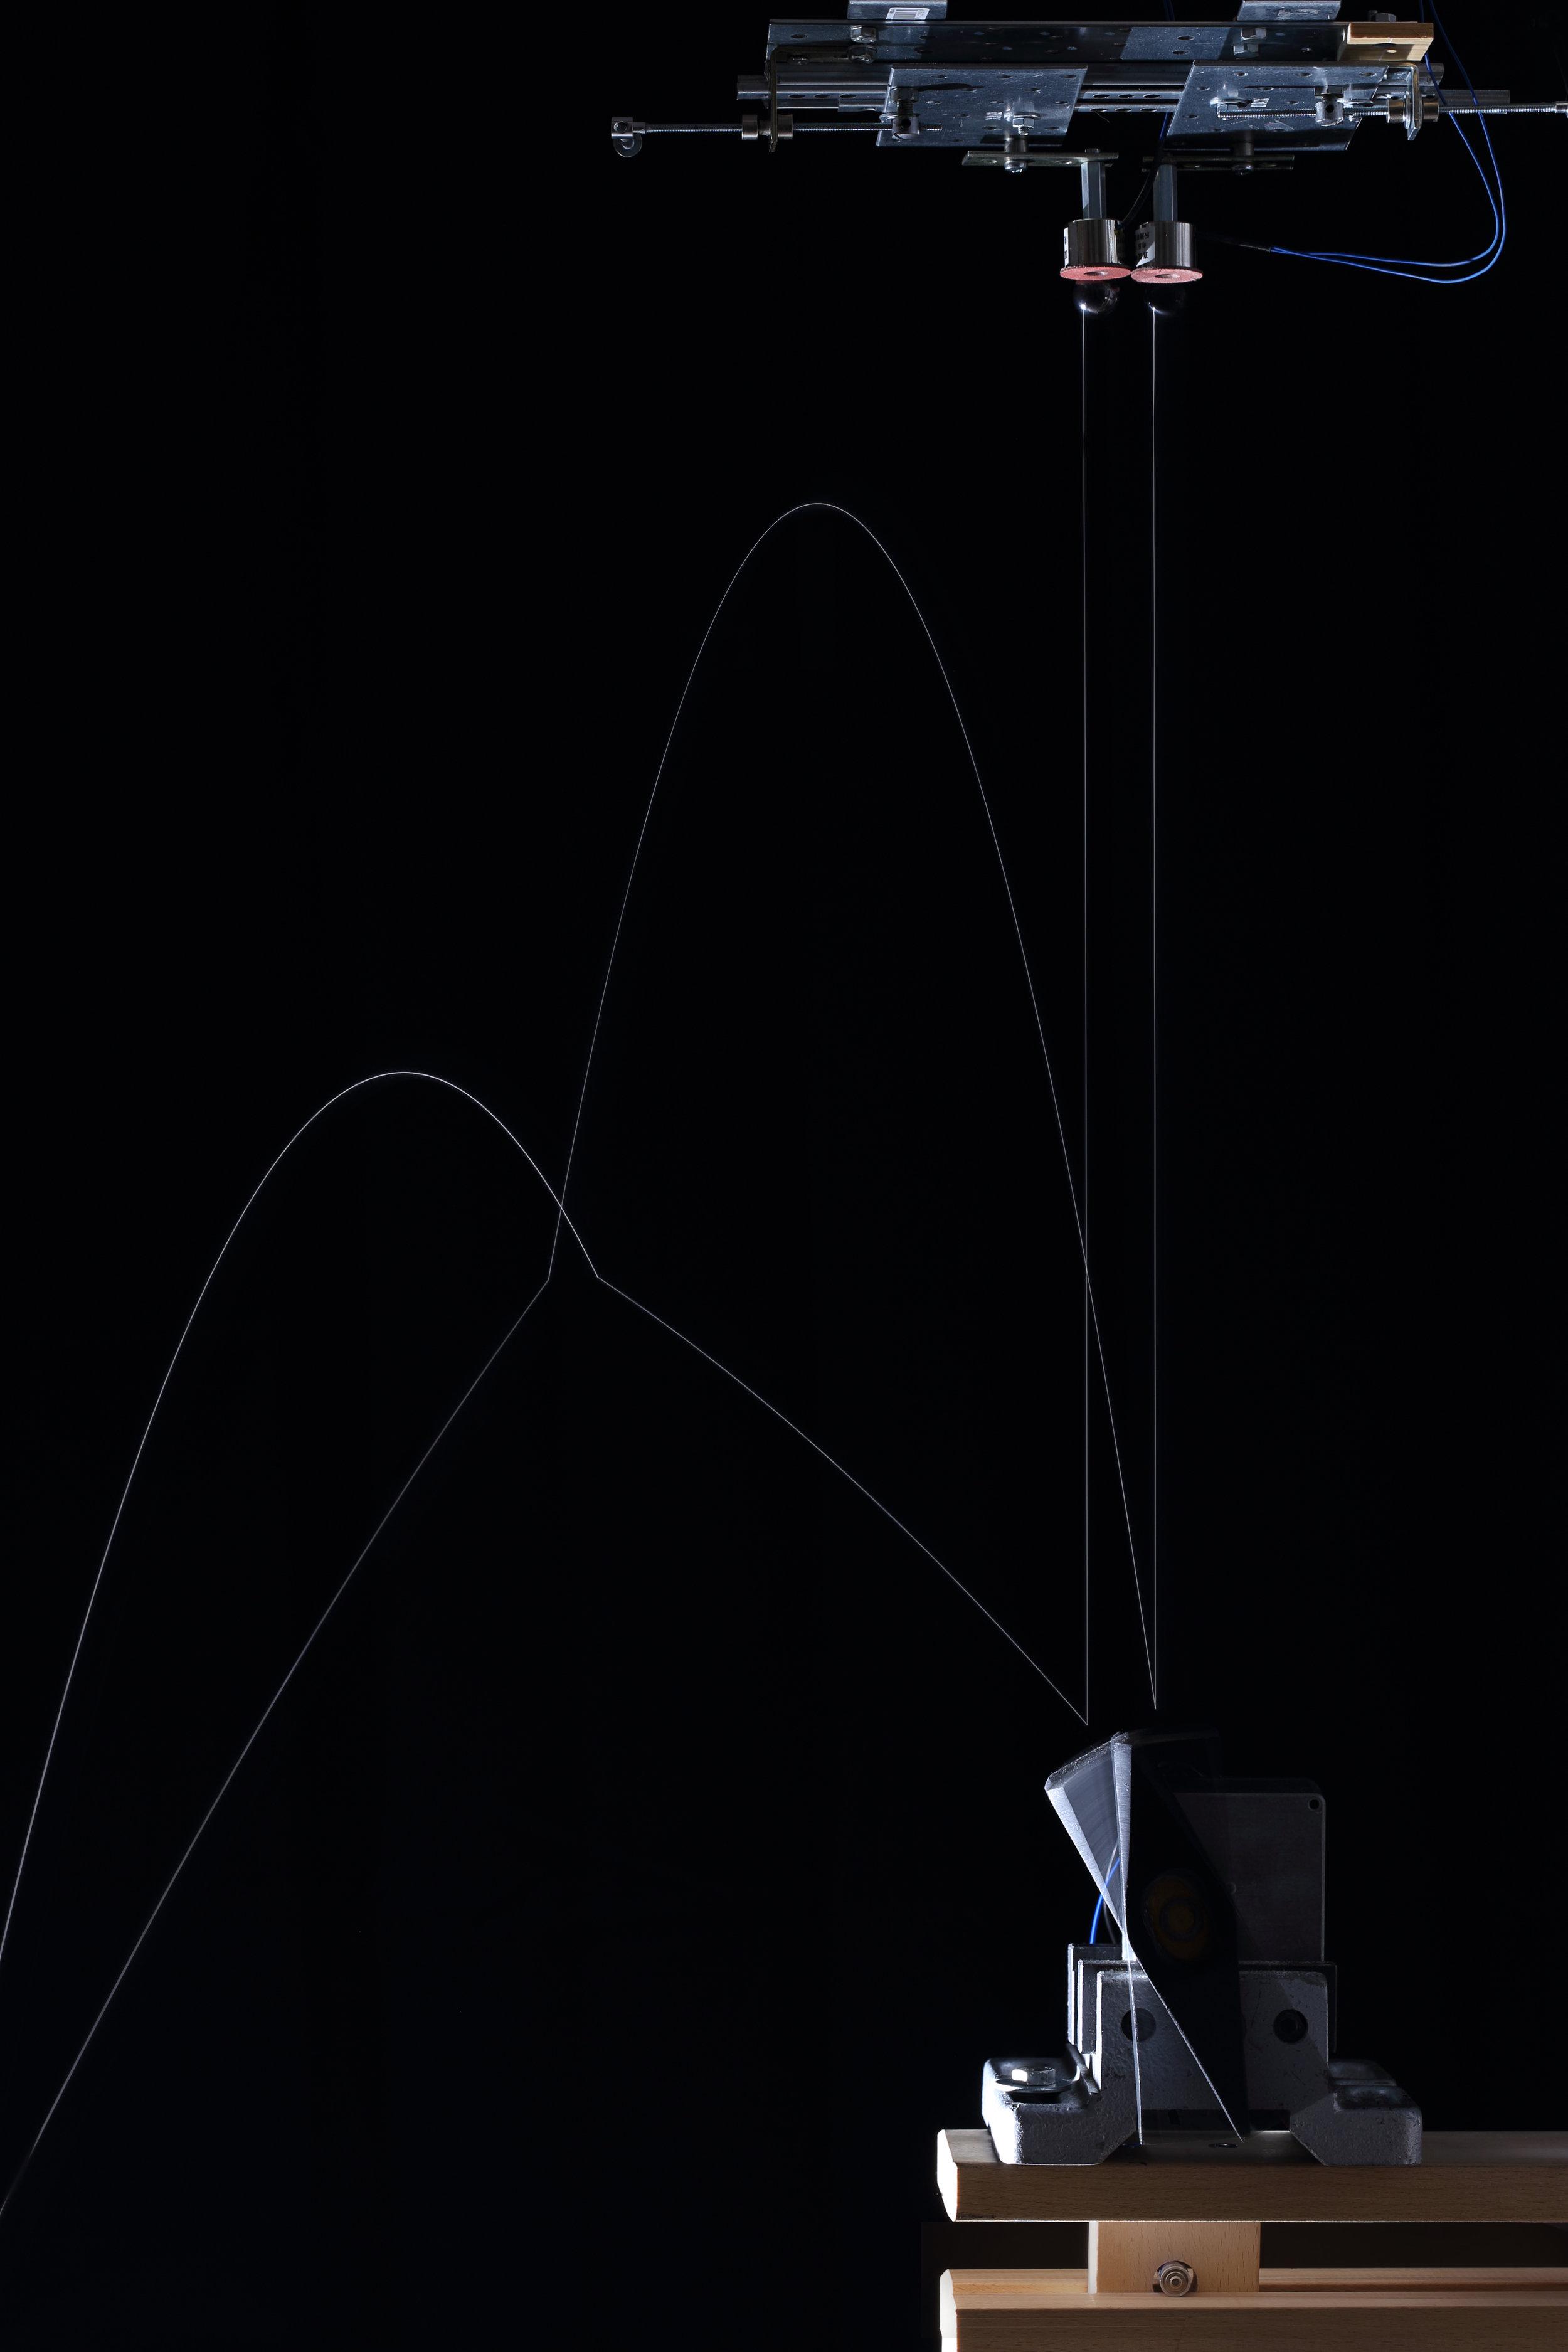 Ütközés 6 / Collision 6, 2018. archival pigment print, 60 x 40 cm, Ed. of 3 + 1 AP